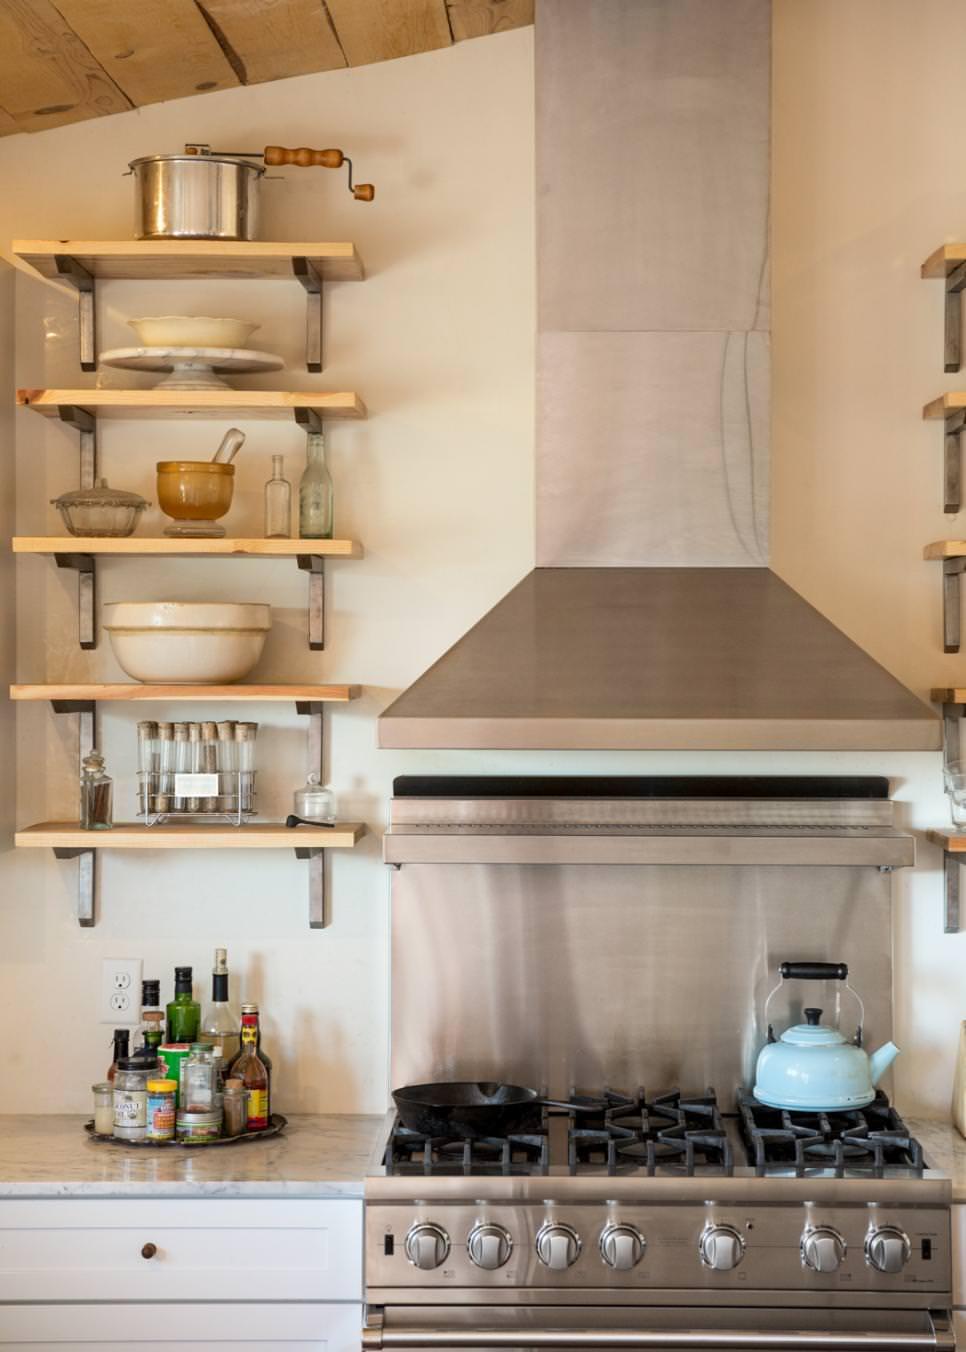 25 Kitchen Shelves Designs Decorating Ideas  Design Trends  Premium PSD Vector Downloads